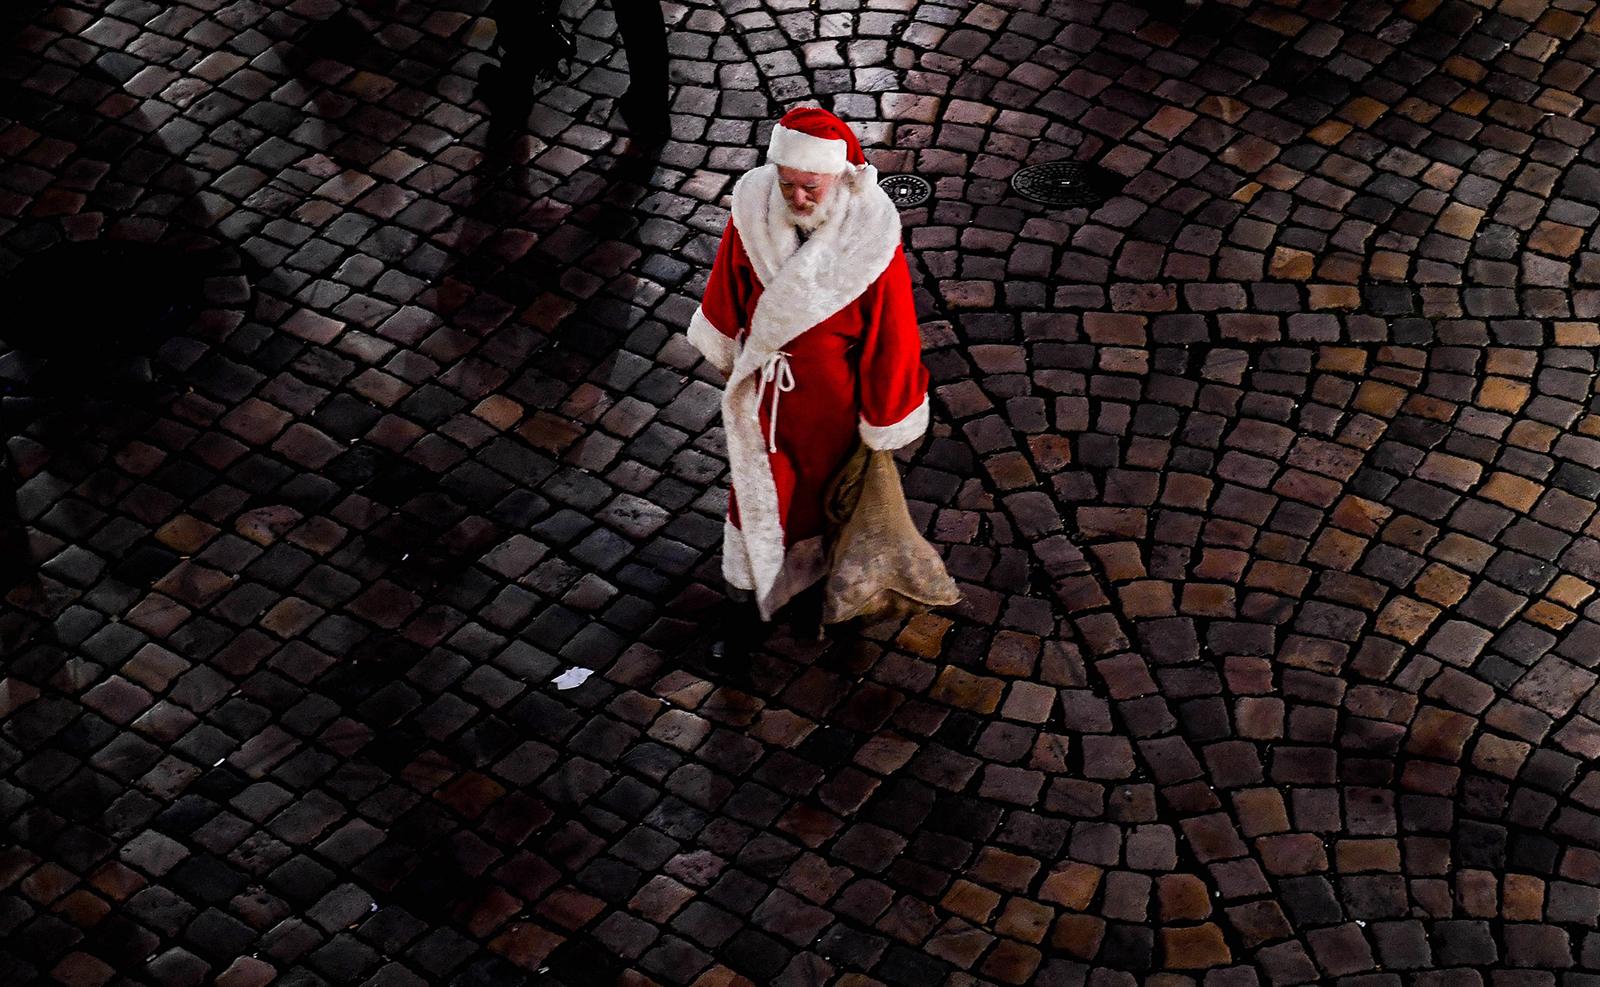 A man dressed as Santa Claus walks near a Christmas market in Dresden, Germany, 11 December 2019. EPA